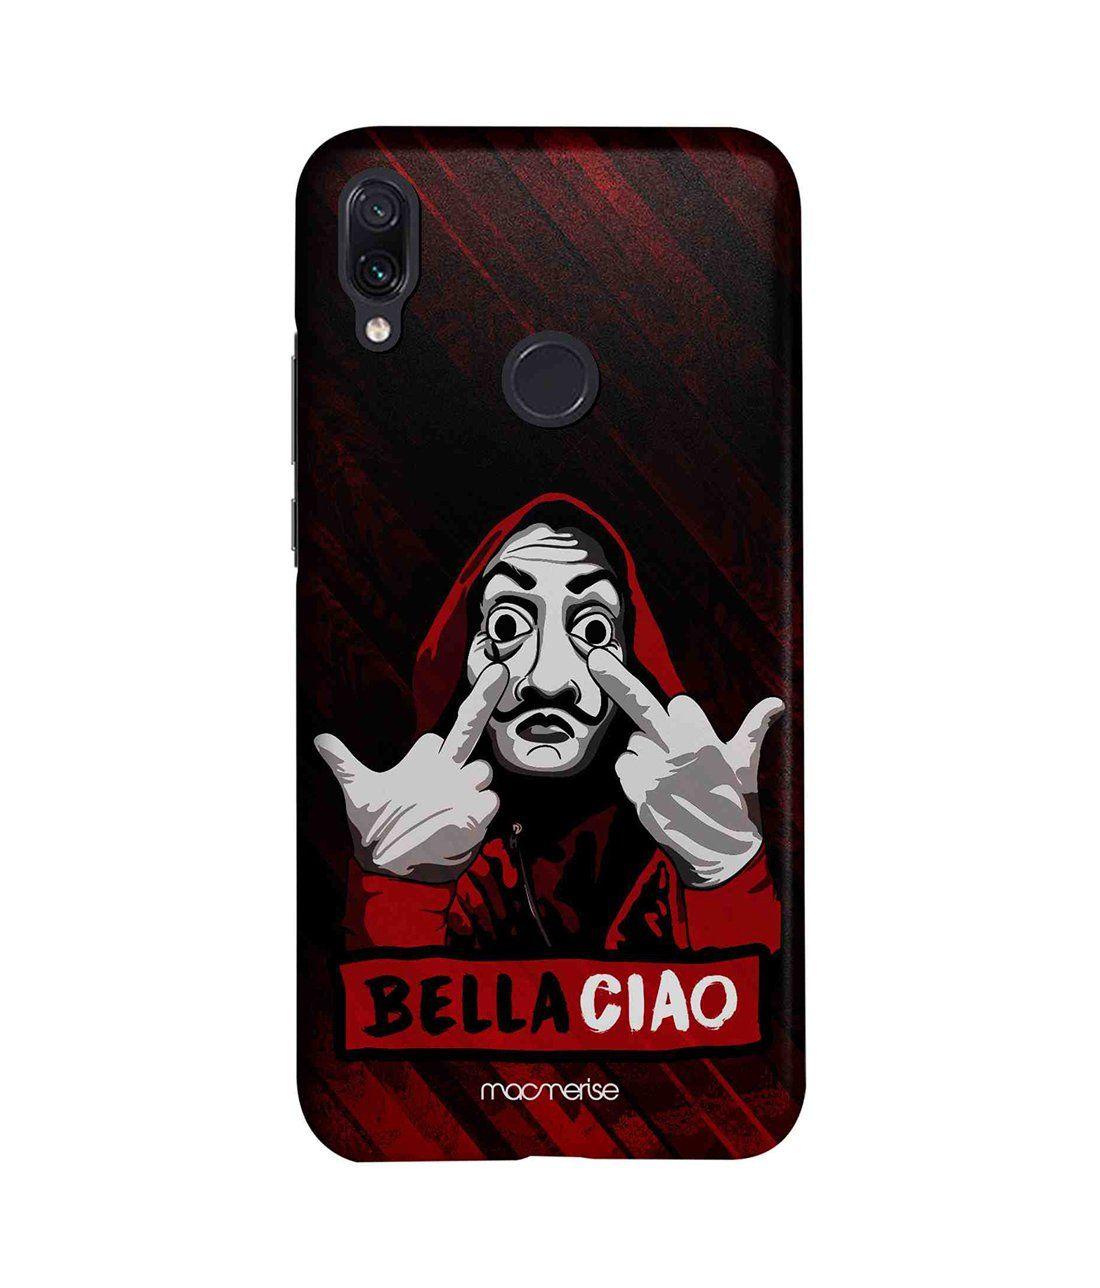 Bella Ciao - Sleek Phone Case for Xiaomi Redmi Note 7